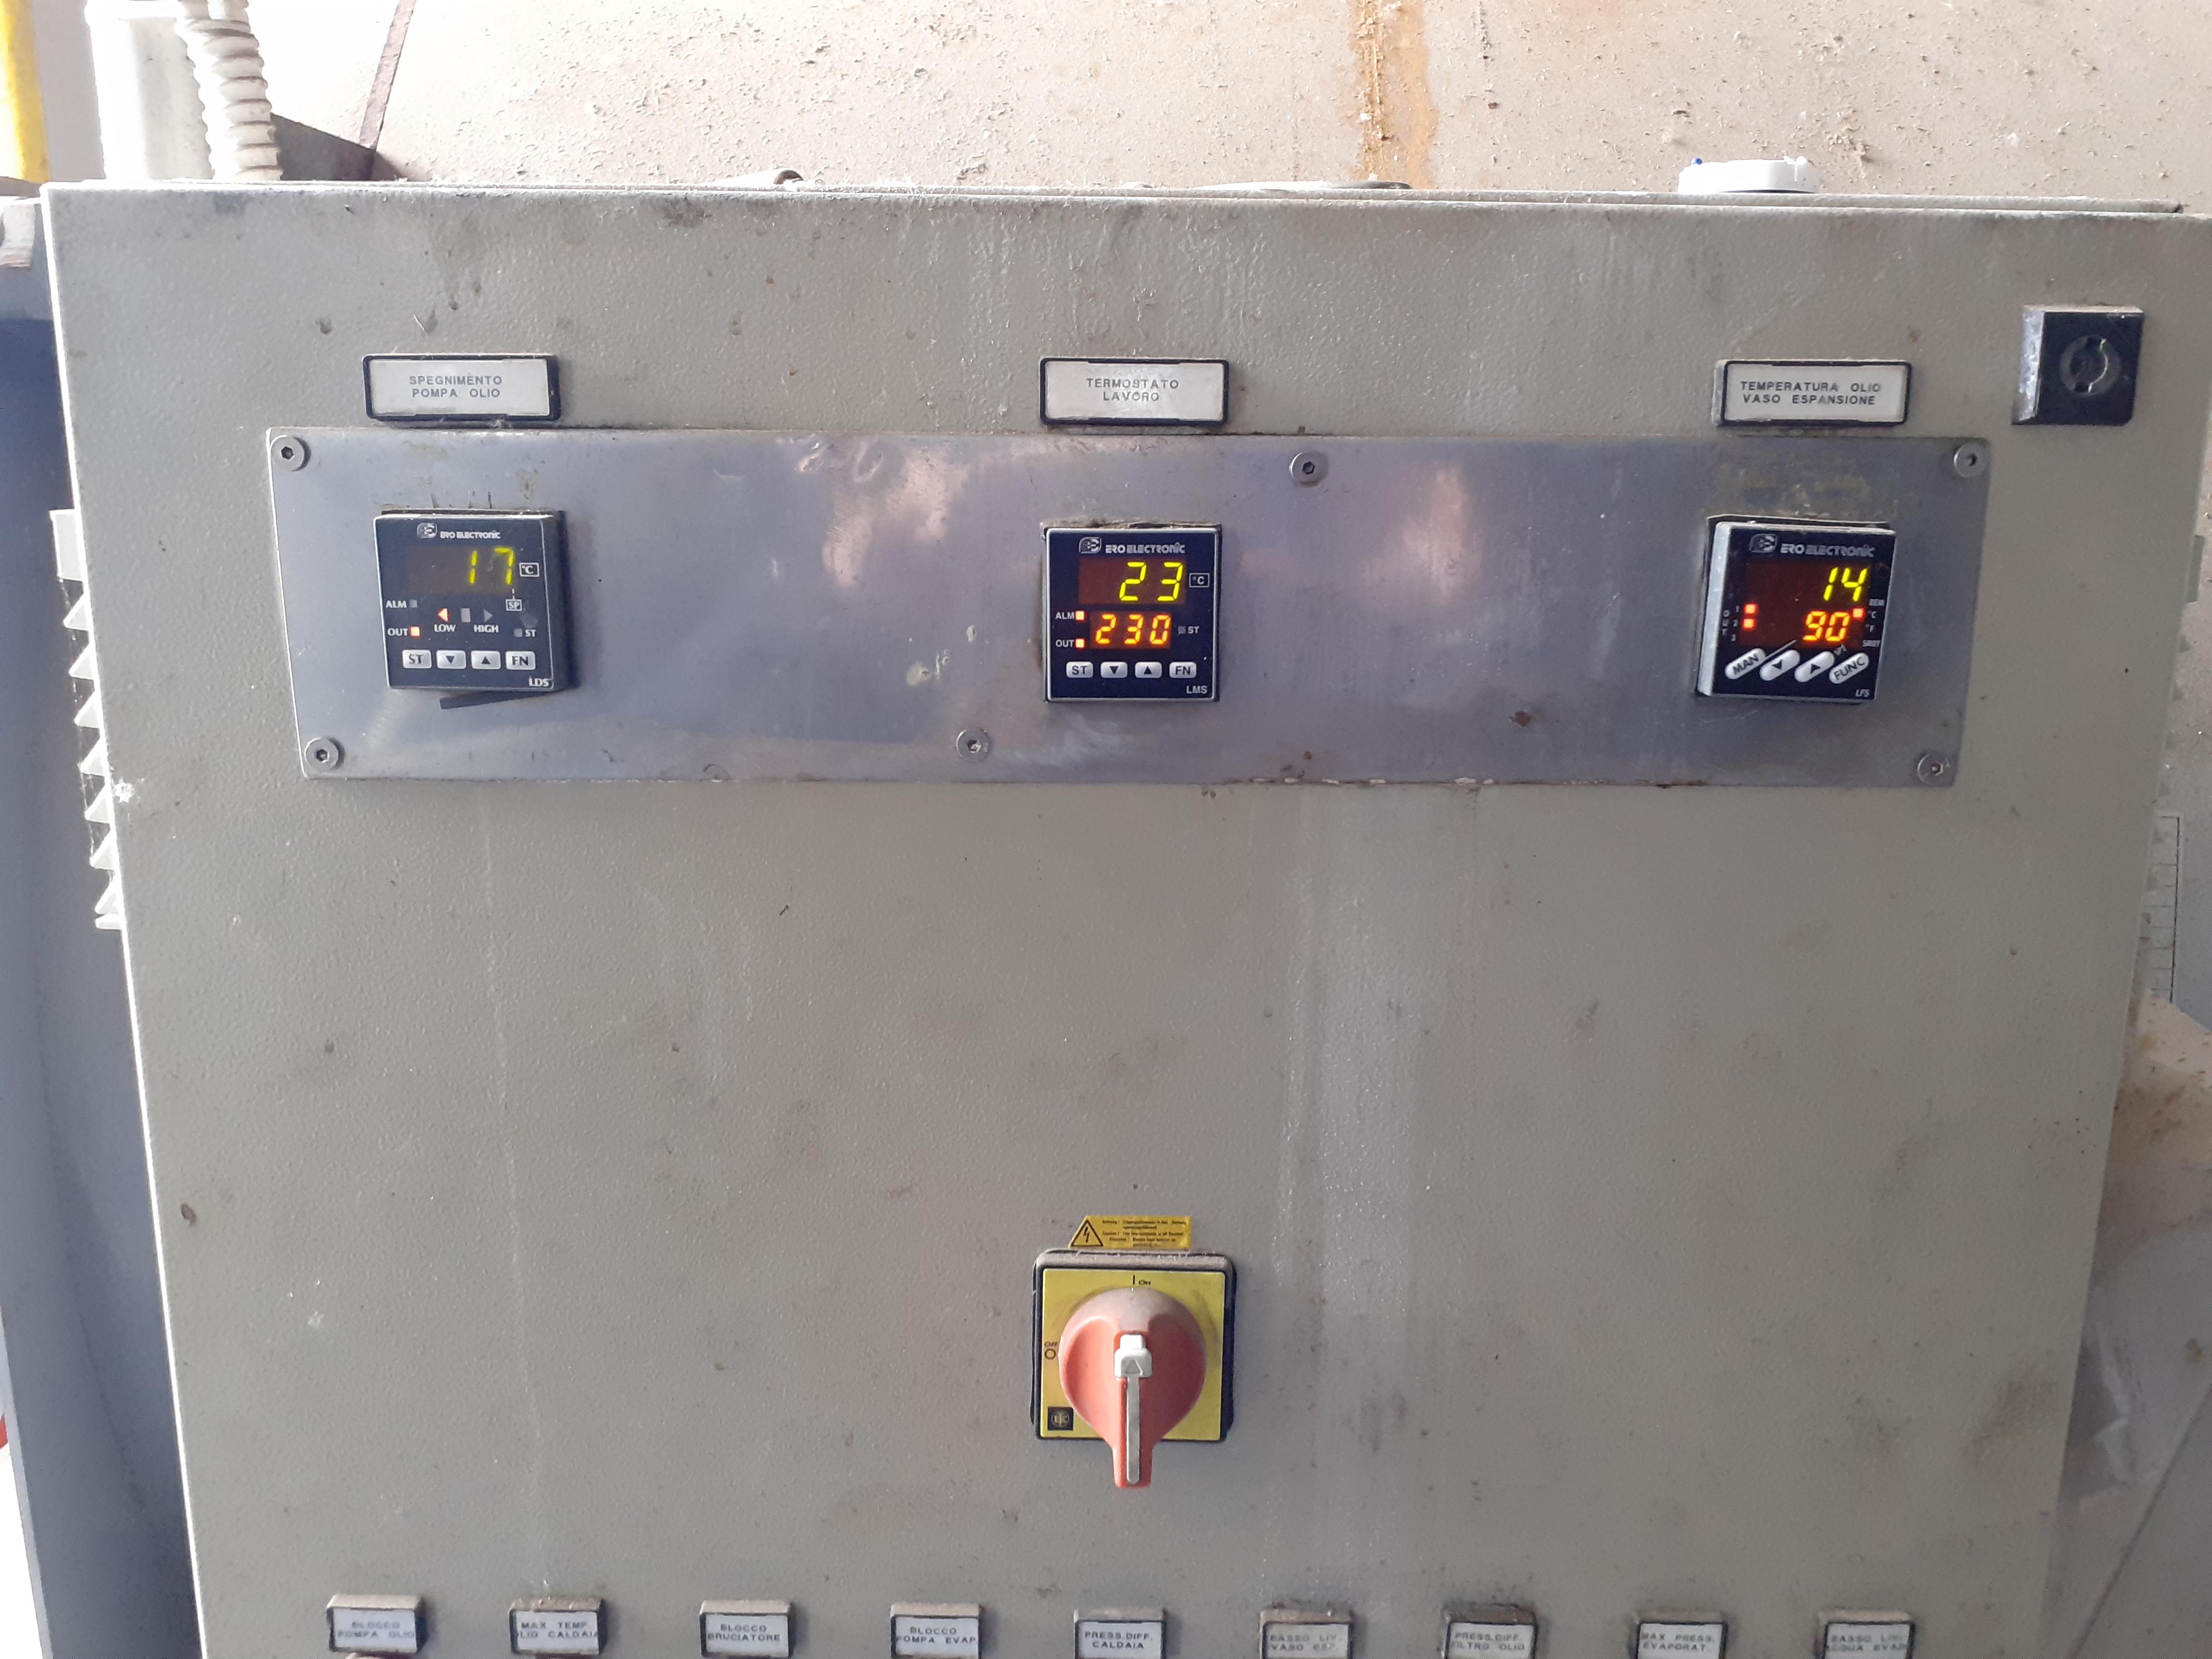 centrale termica in vendita - foto 9